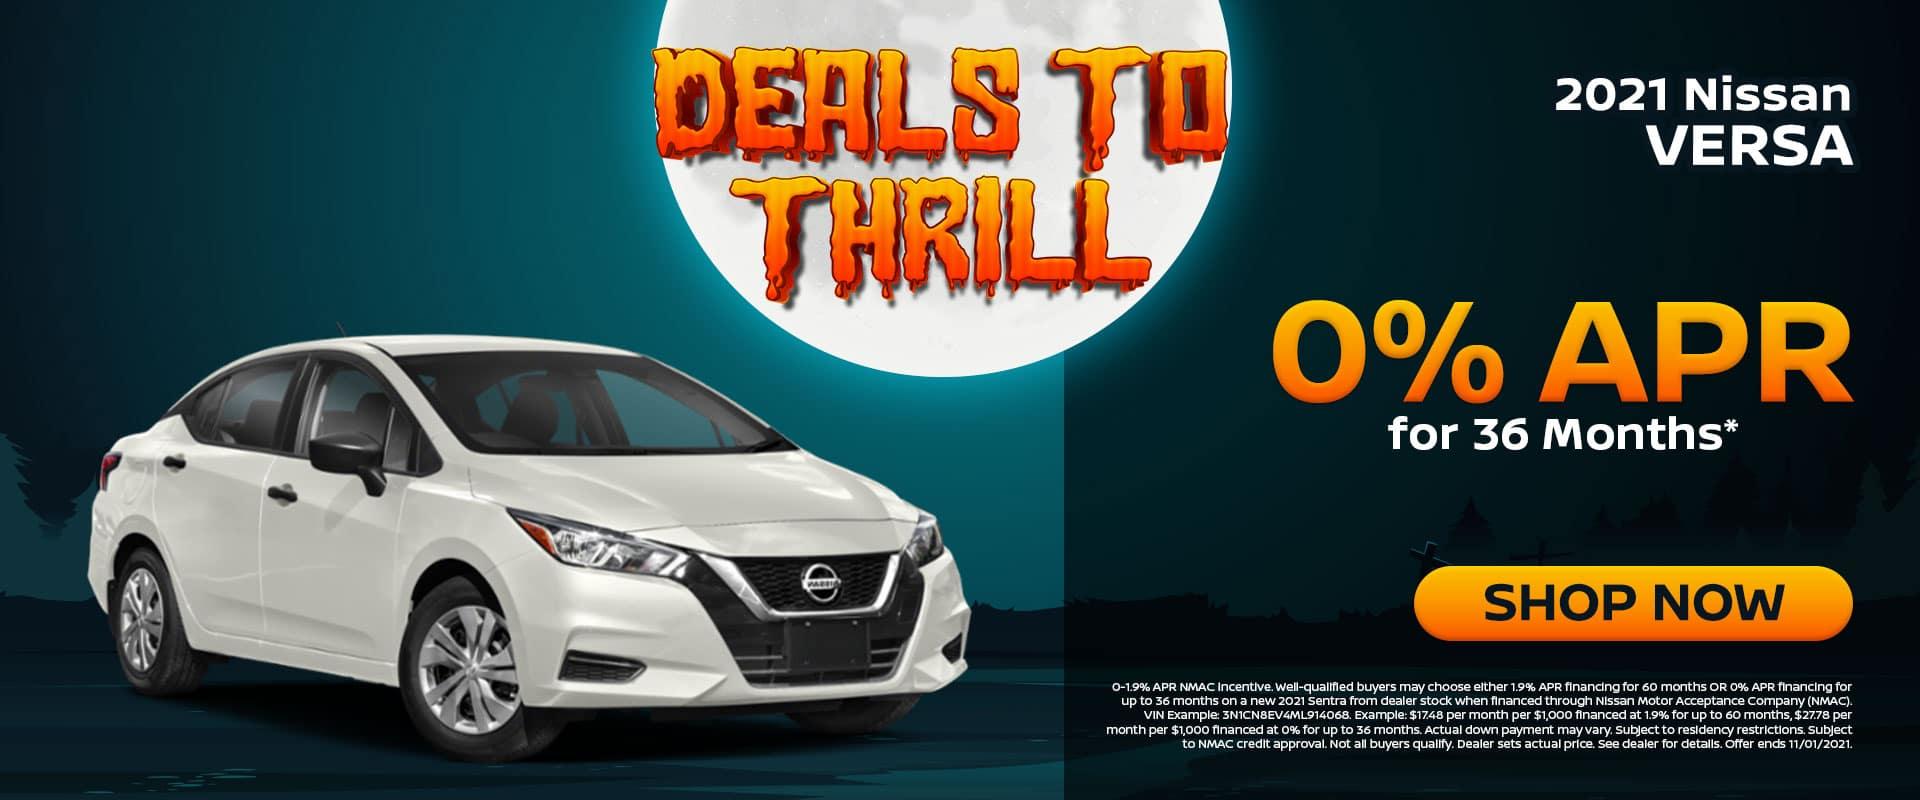 2021 Nissan Versa Offer in Greenville, TX